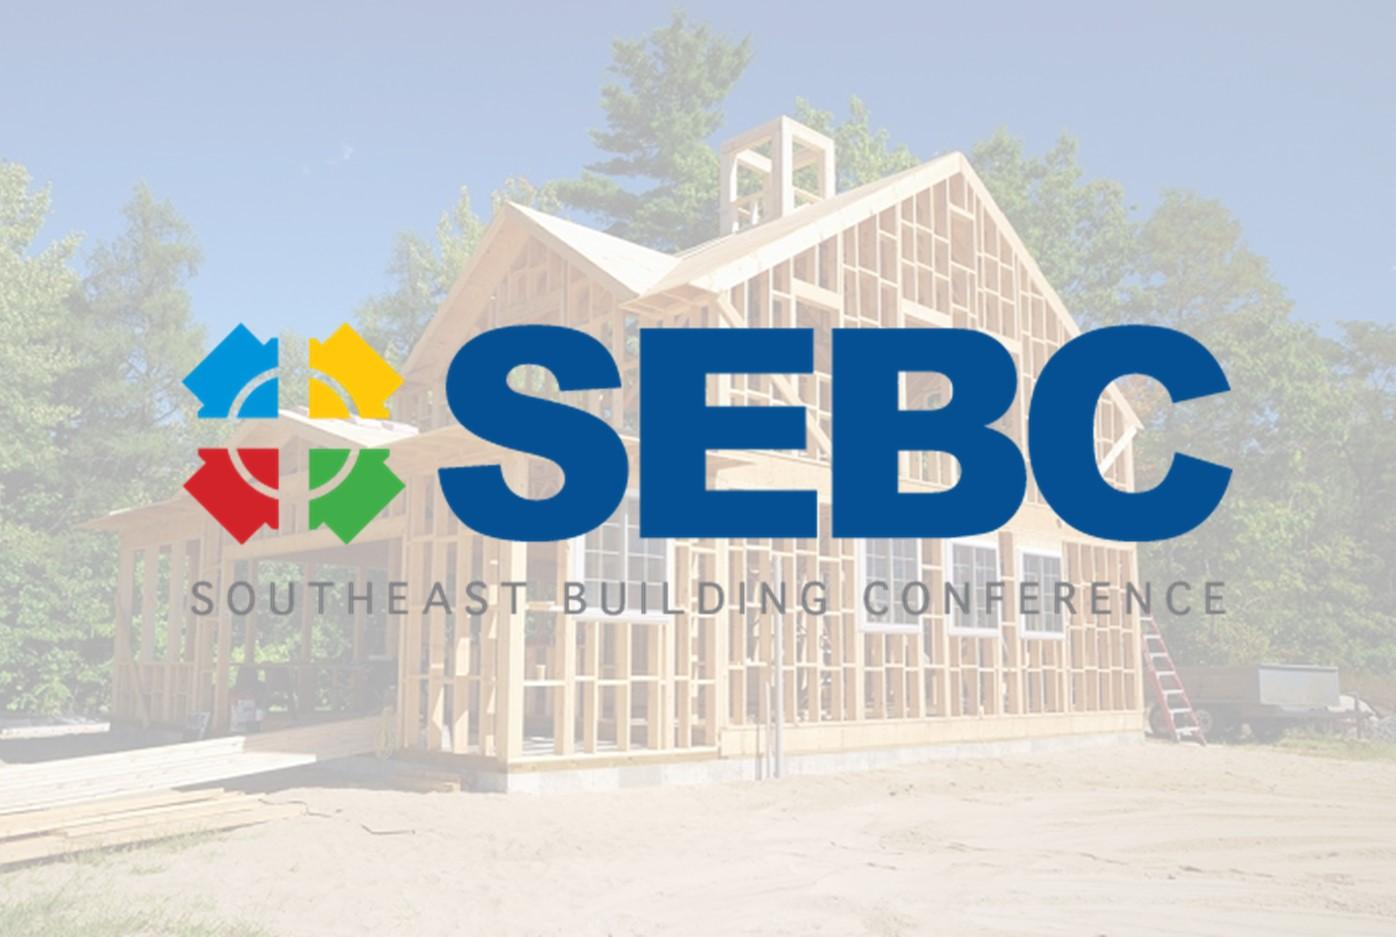 SEBC Orlando 2018 Address and Event